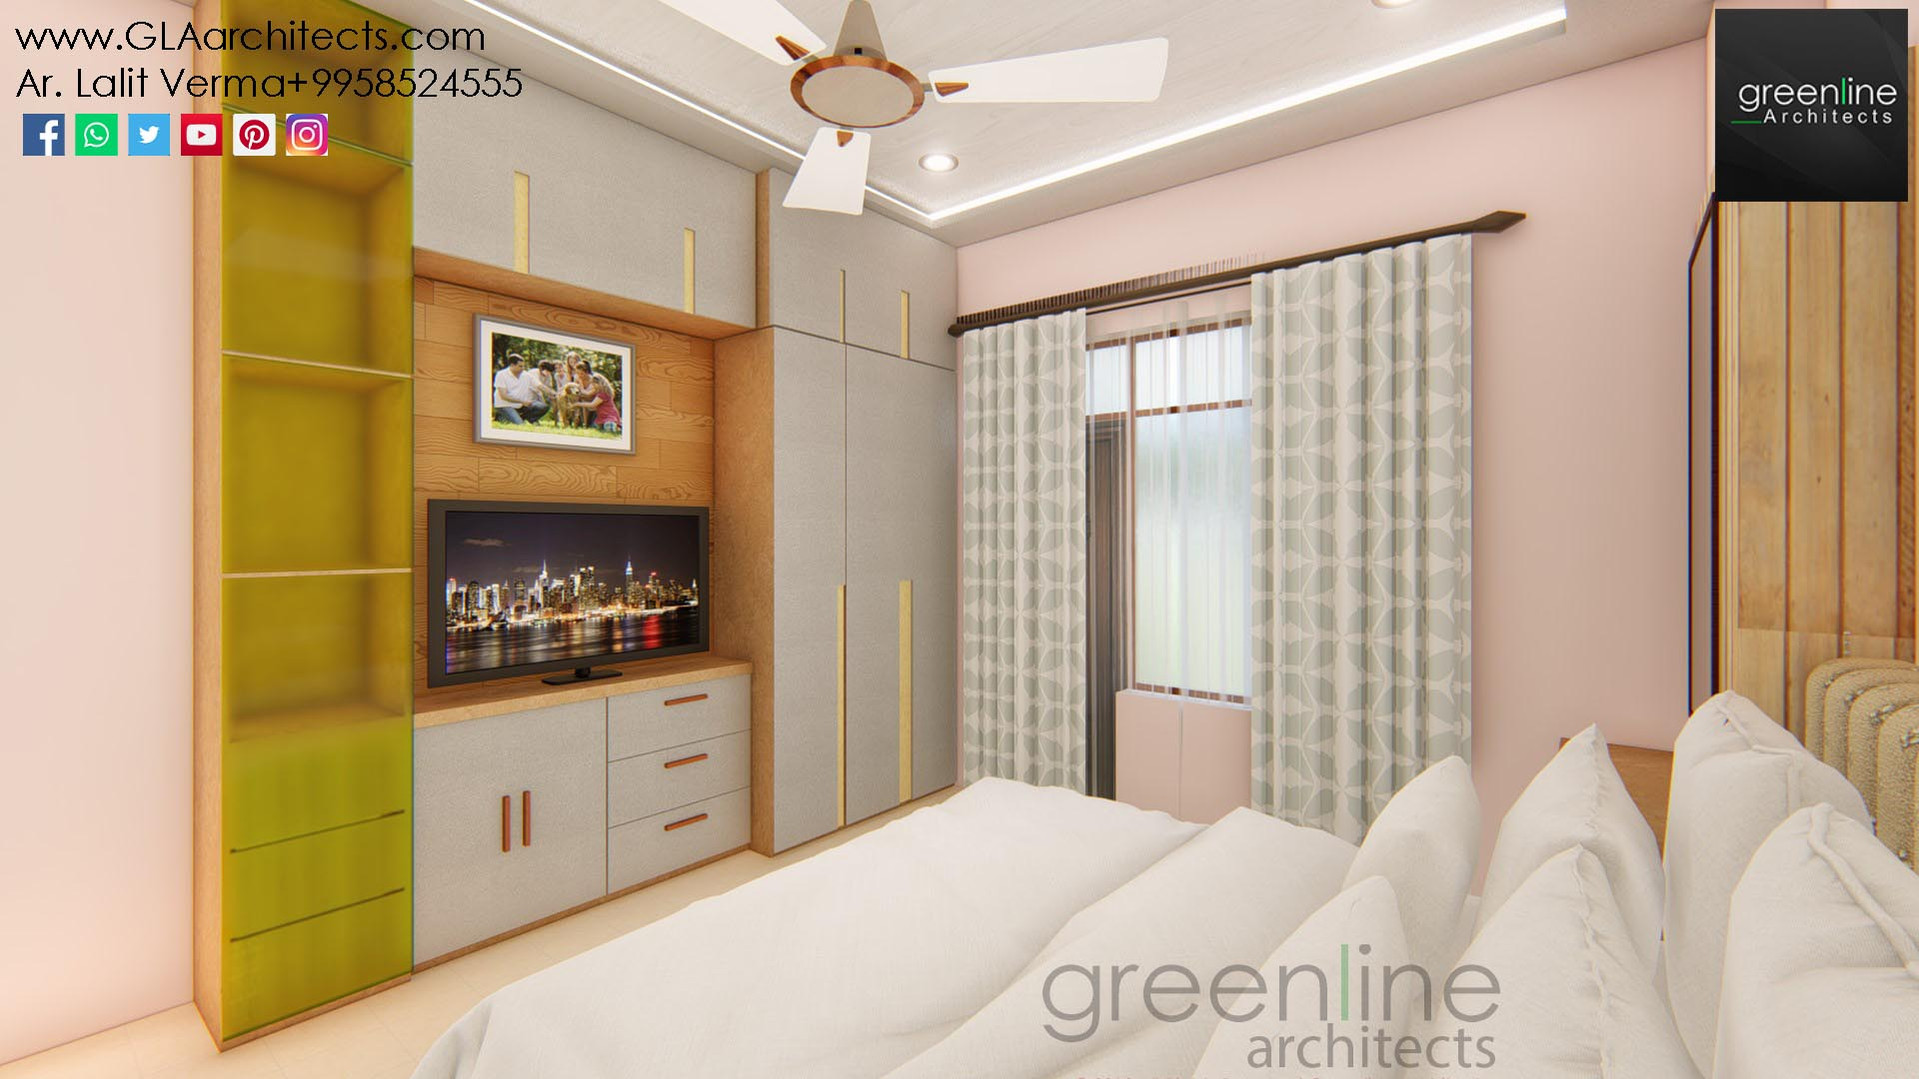 3 BHK-Apartment_Home Interior (11).jpg